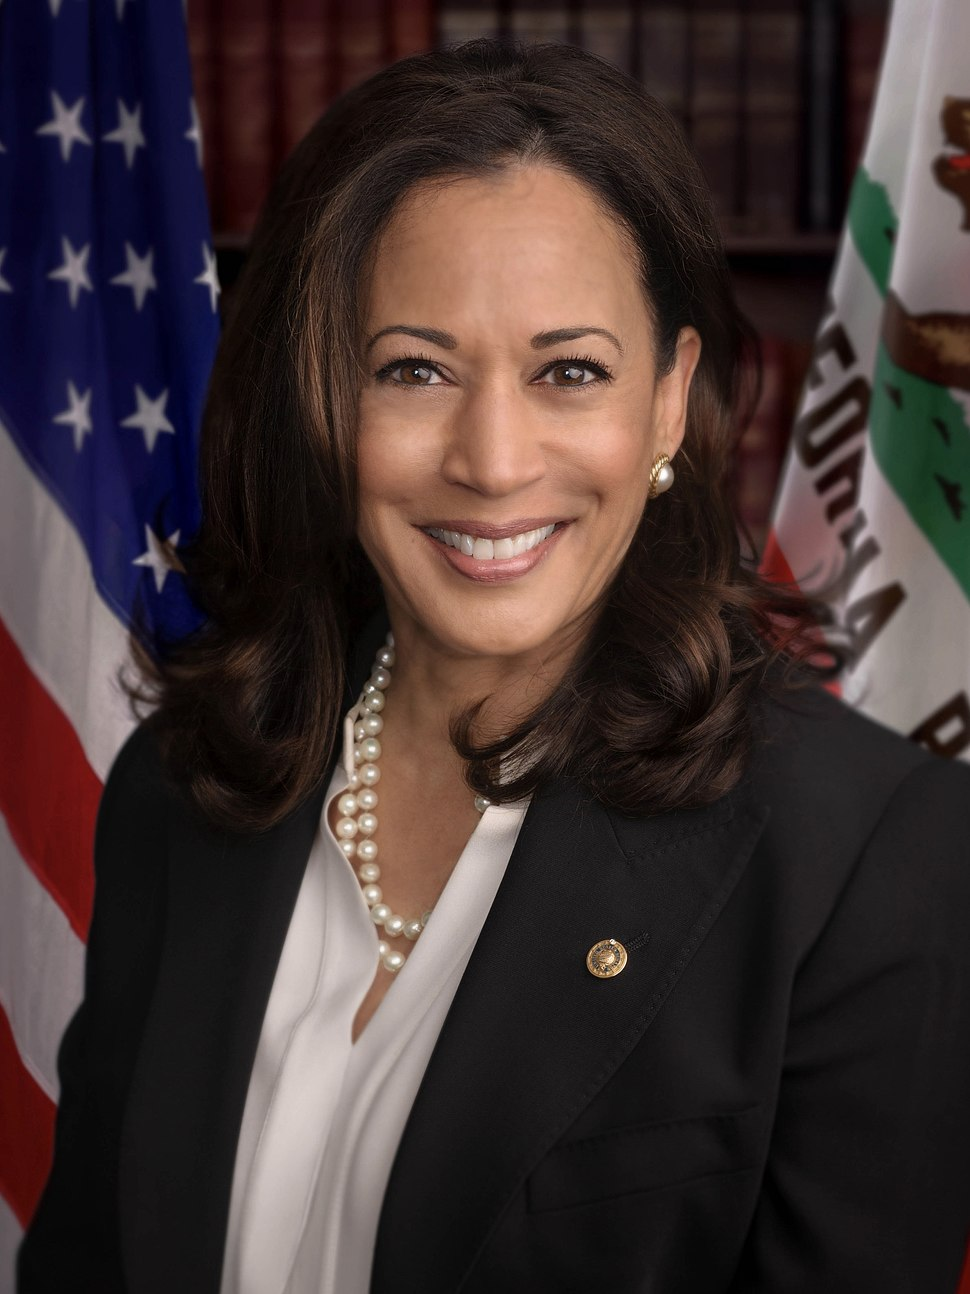 Senator Harris official senate portrait